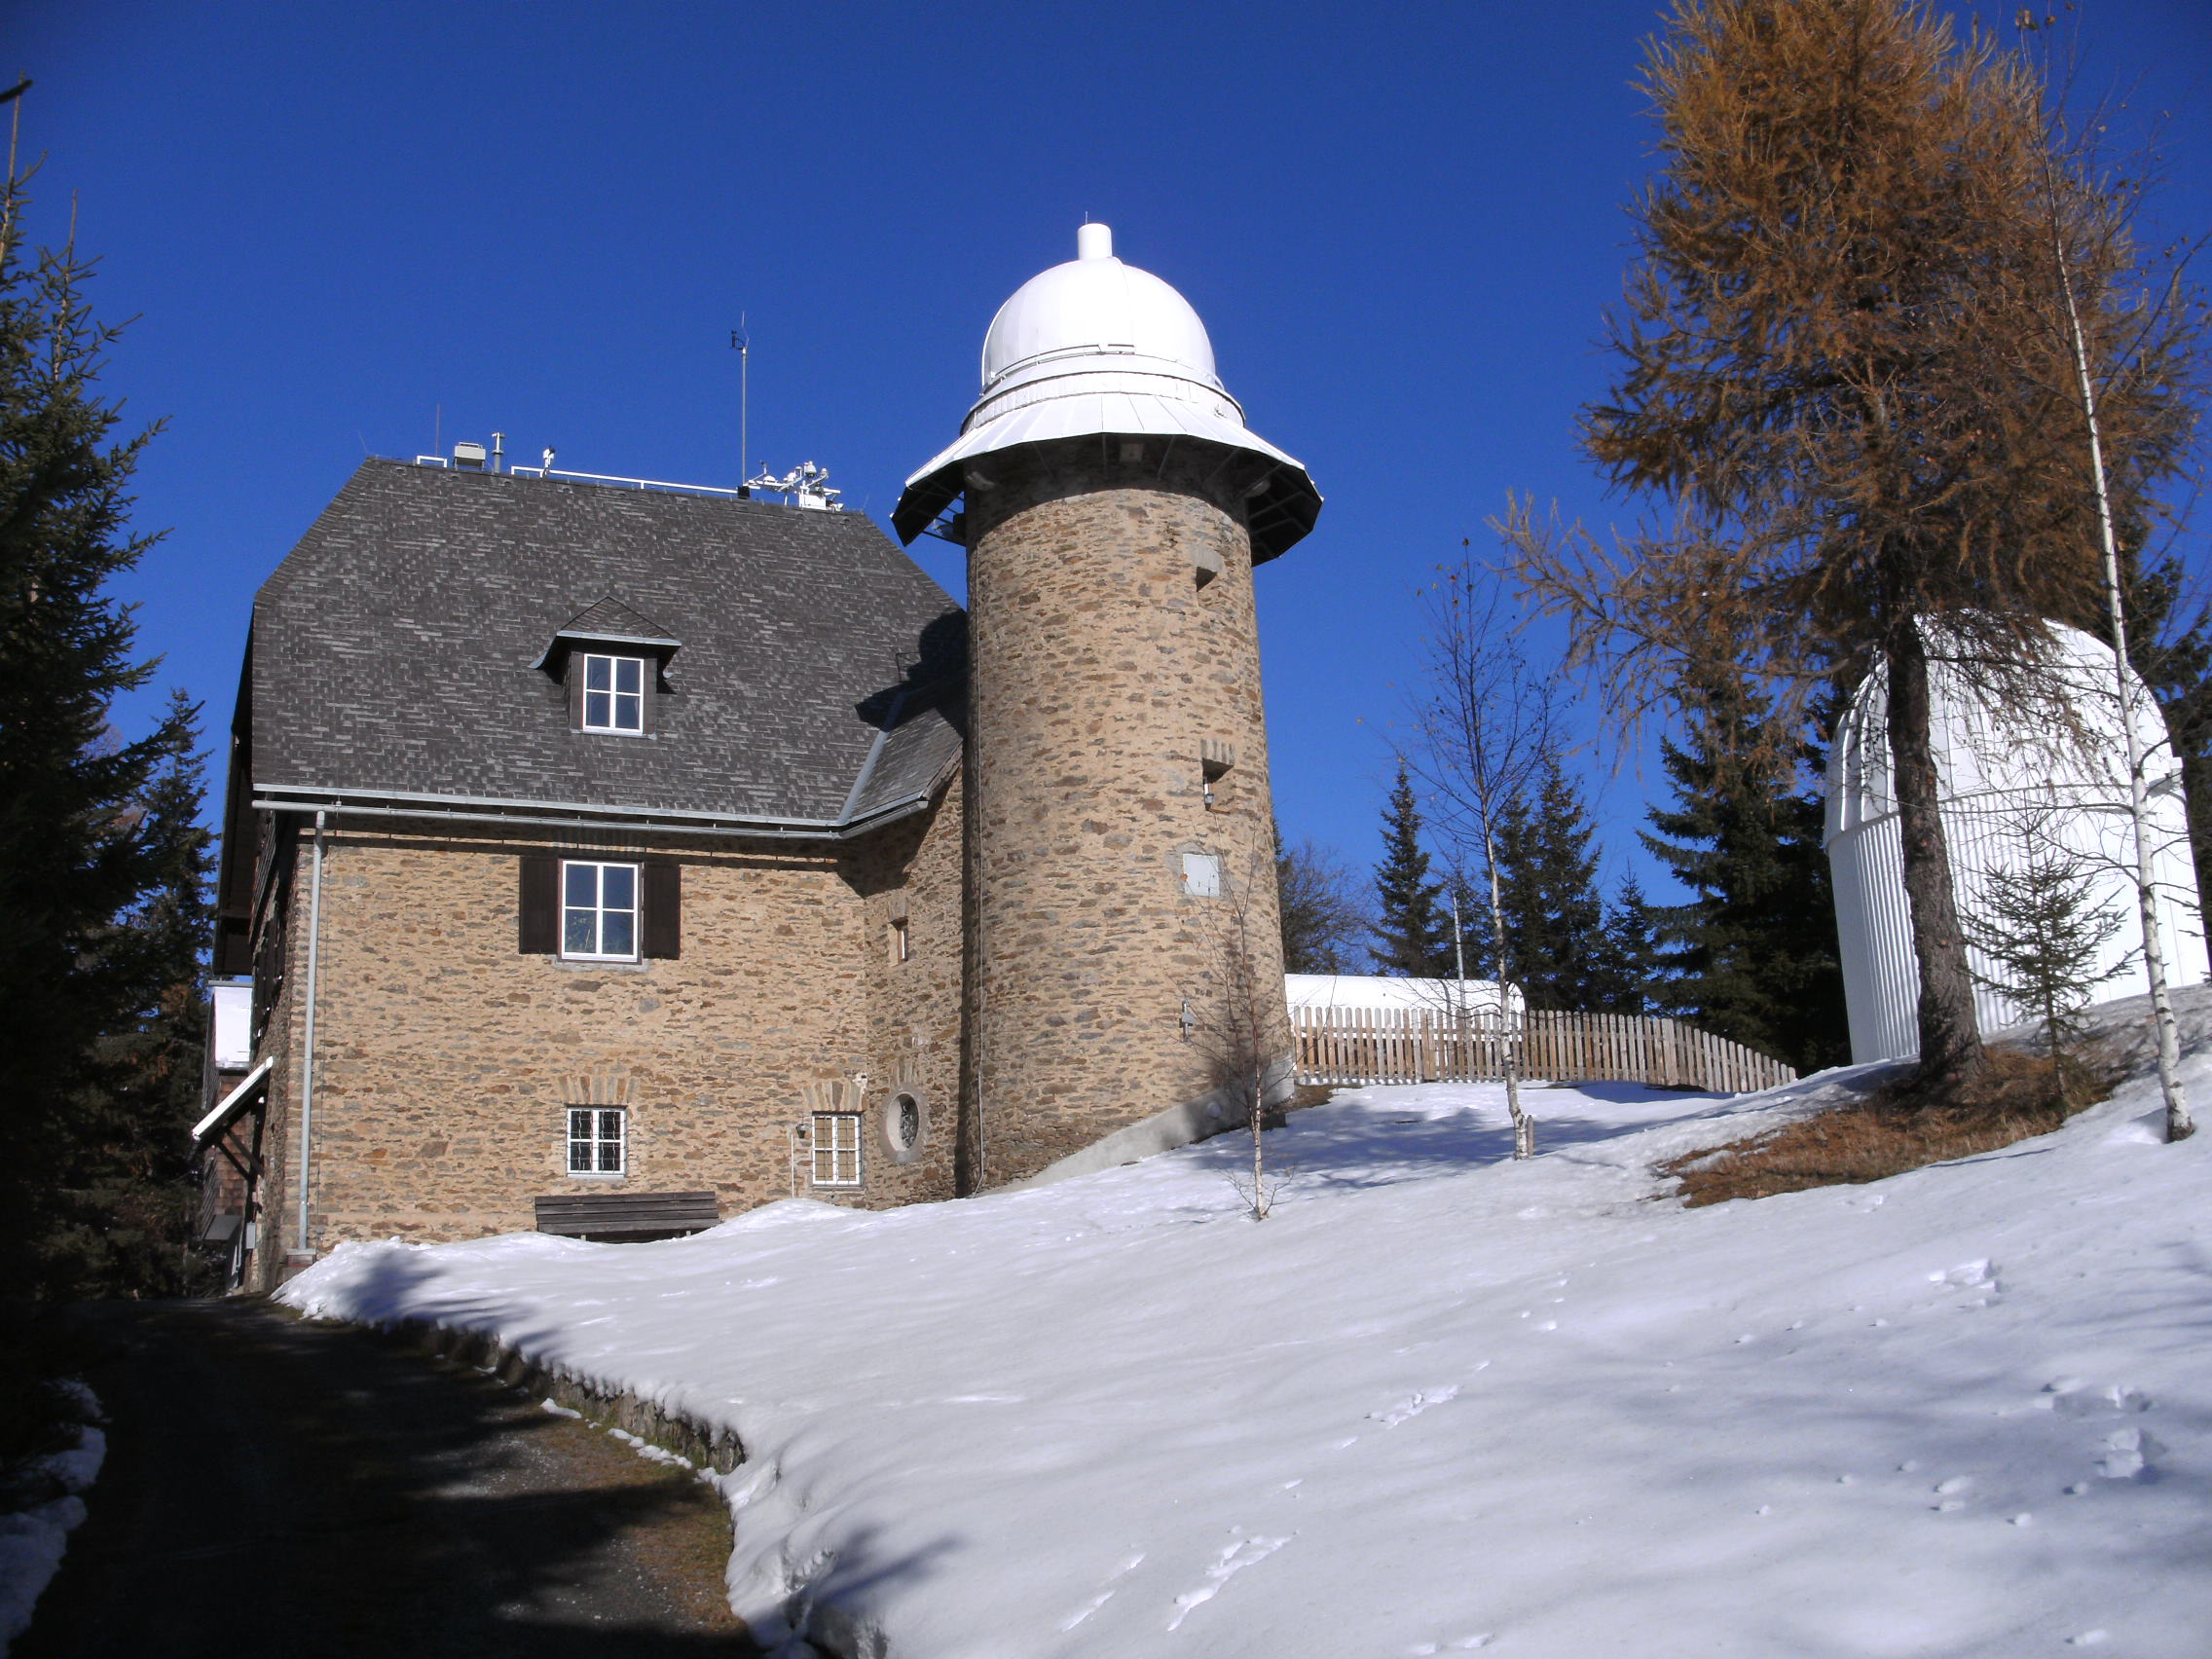 Kanzelhoehe Solar Observatory